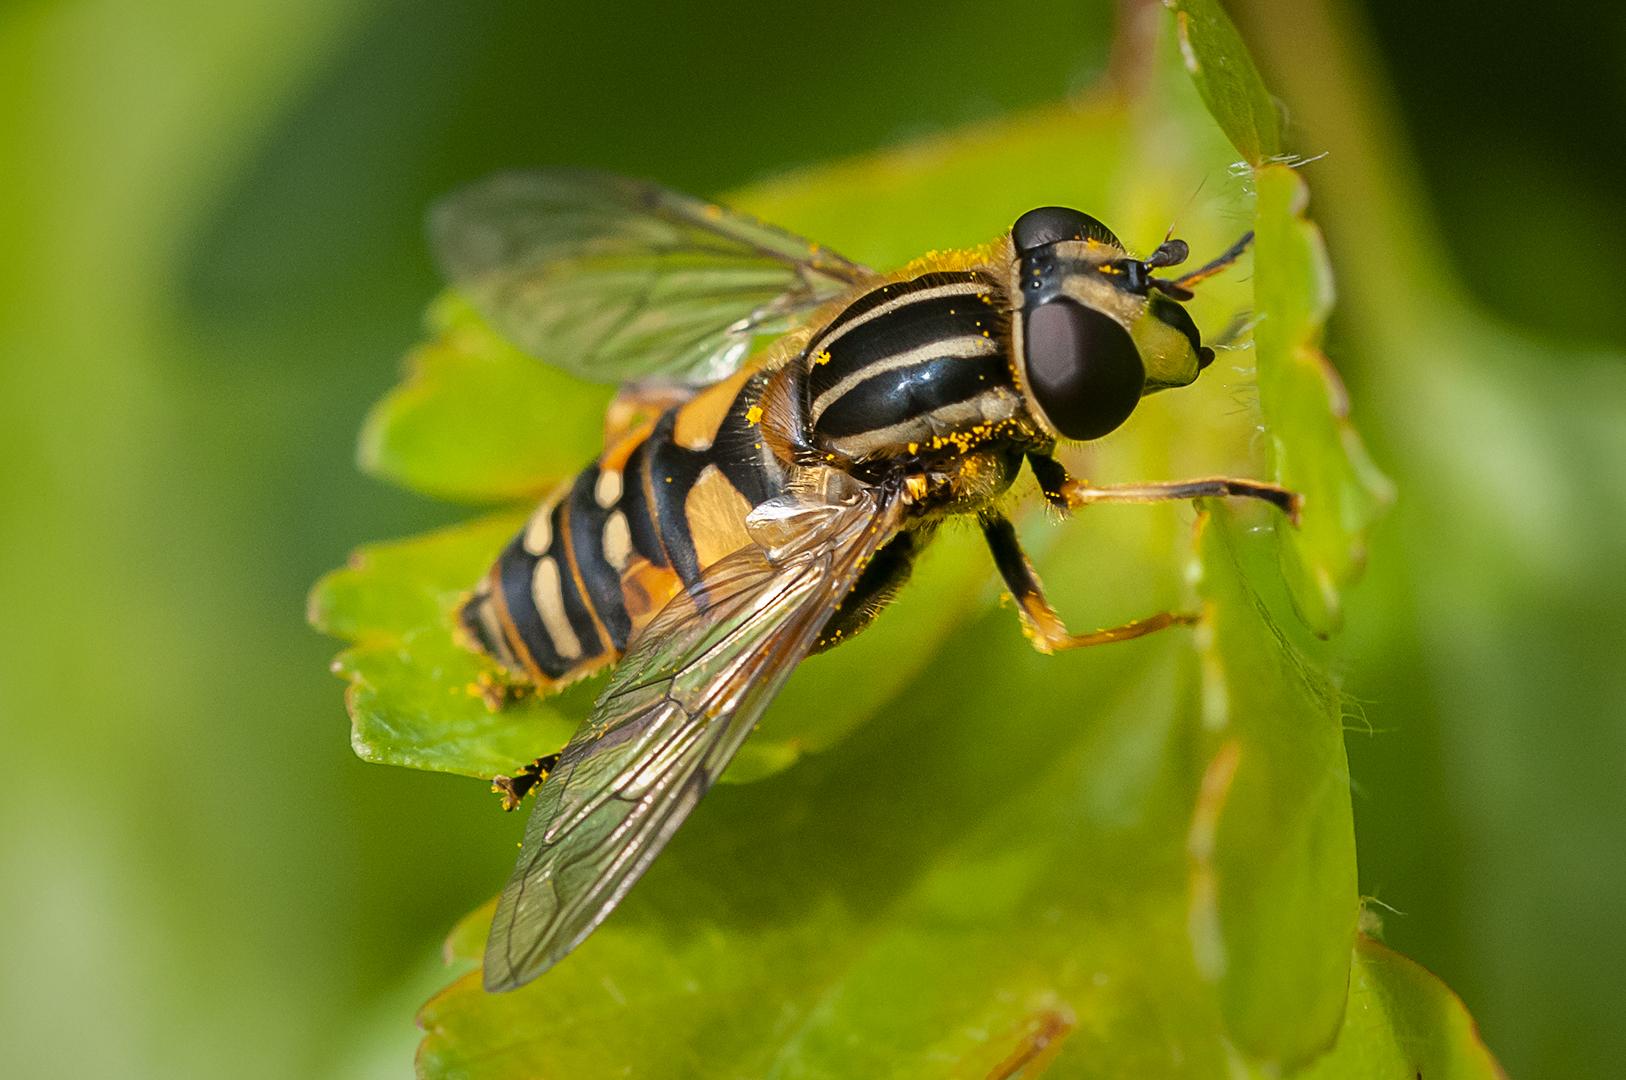 Sun-fly (Helophilus pendulus)_Ian Gregor